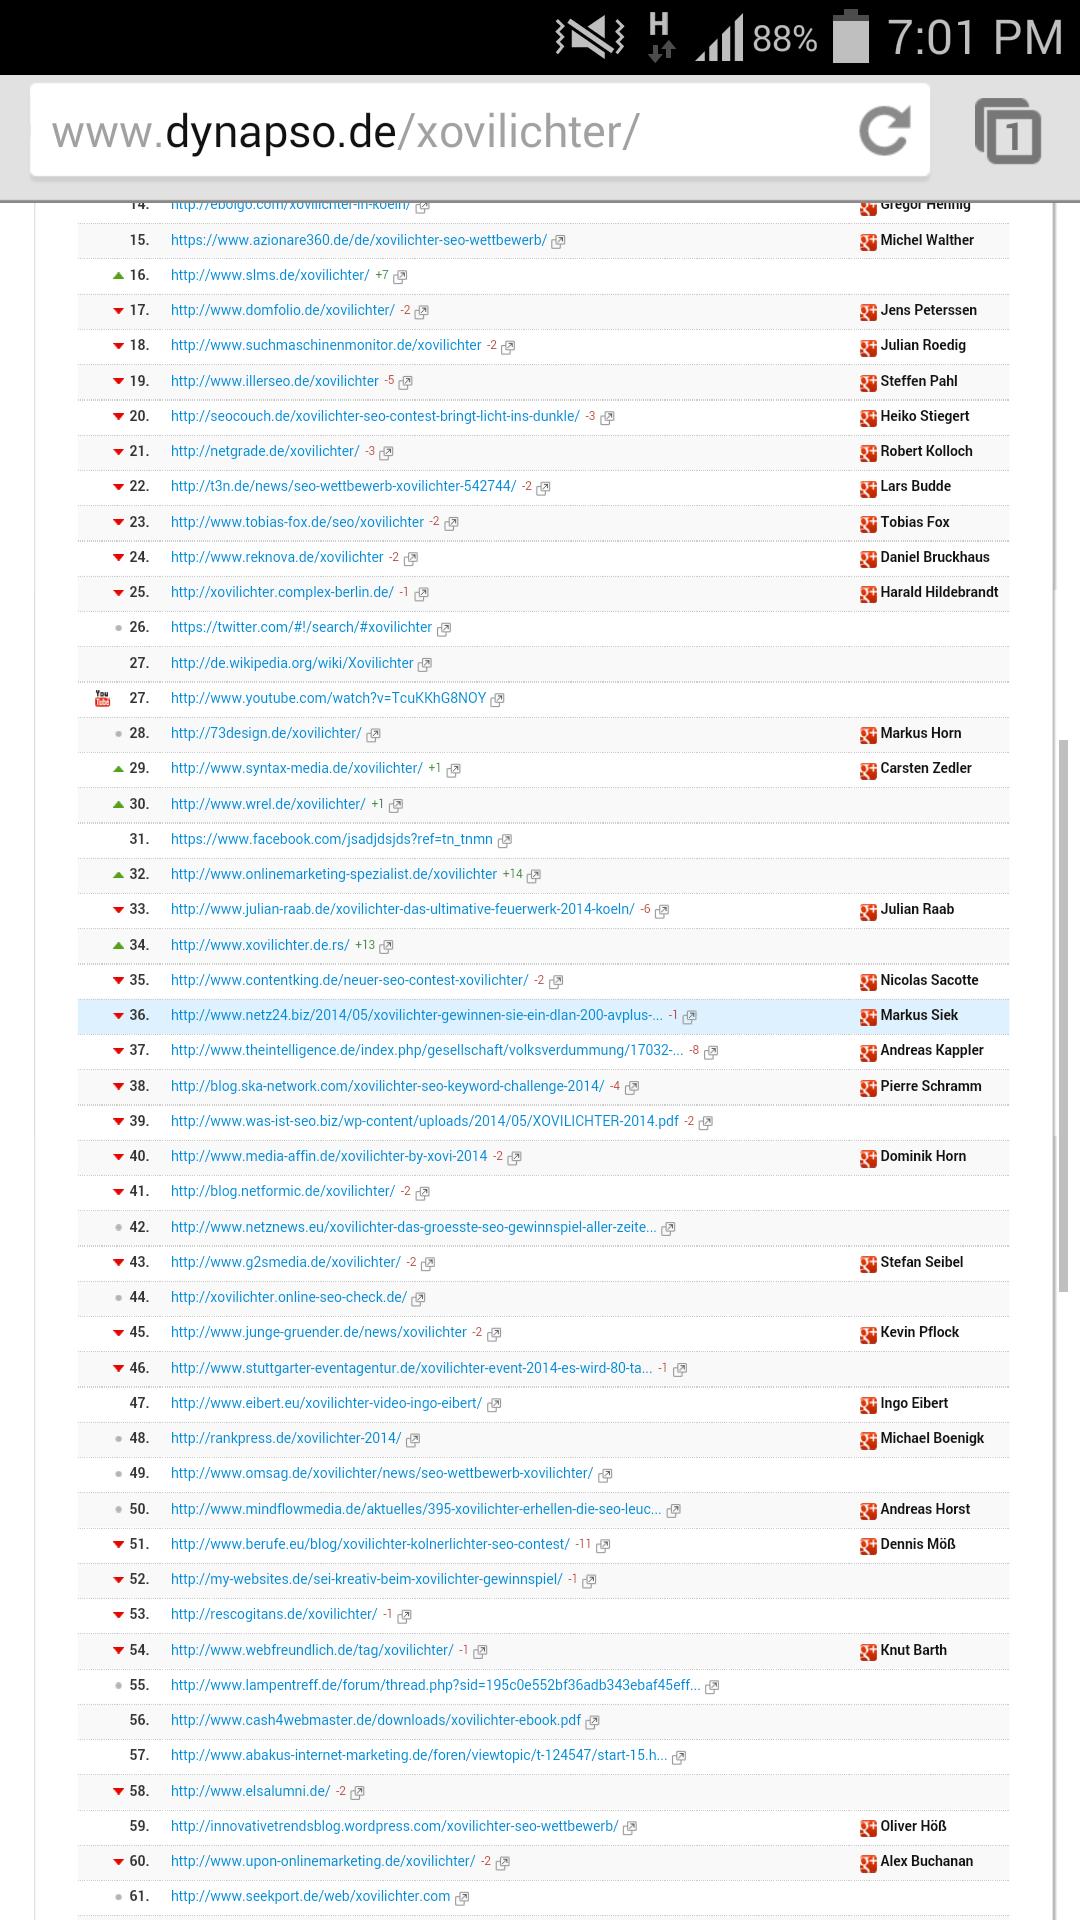 Xovilichter Top 35